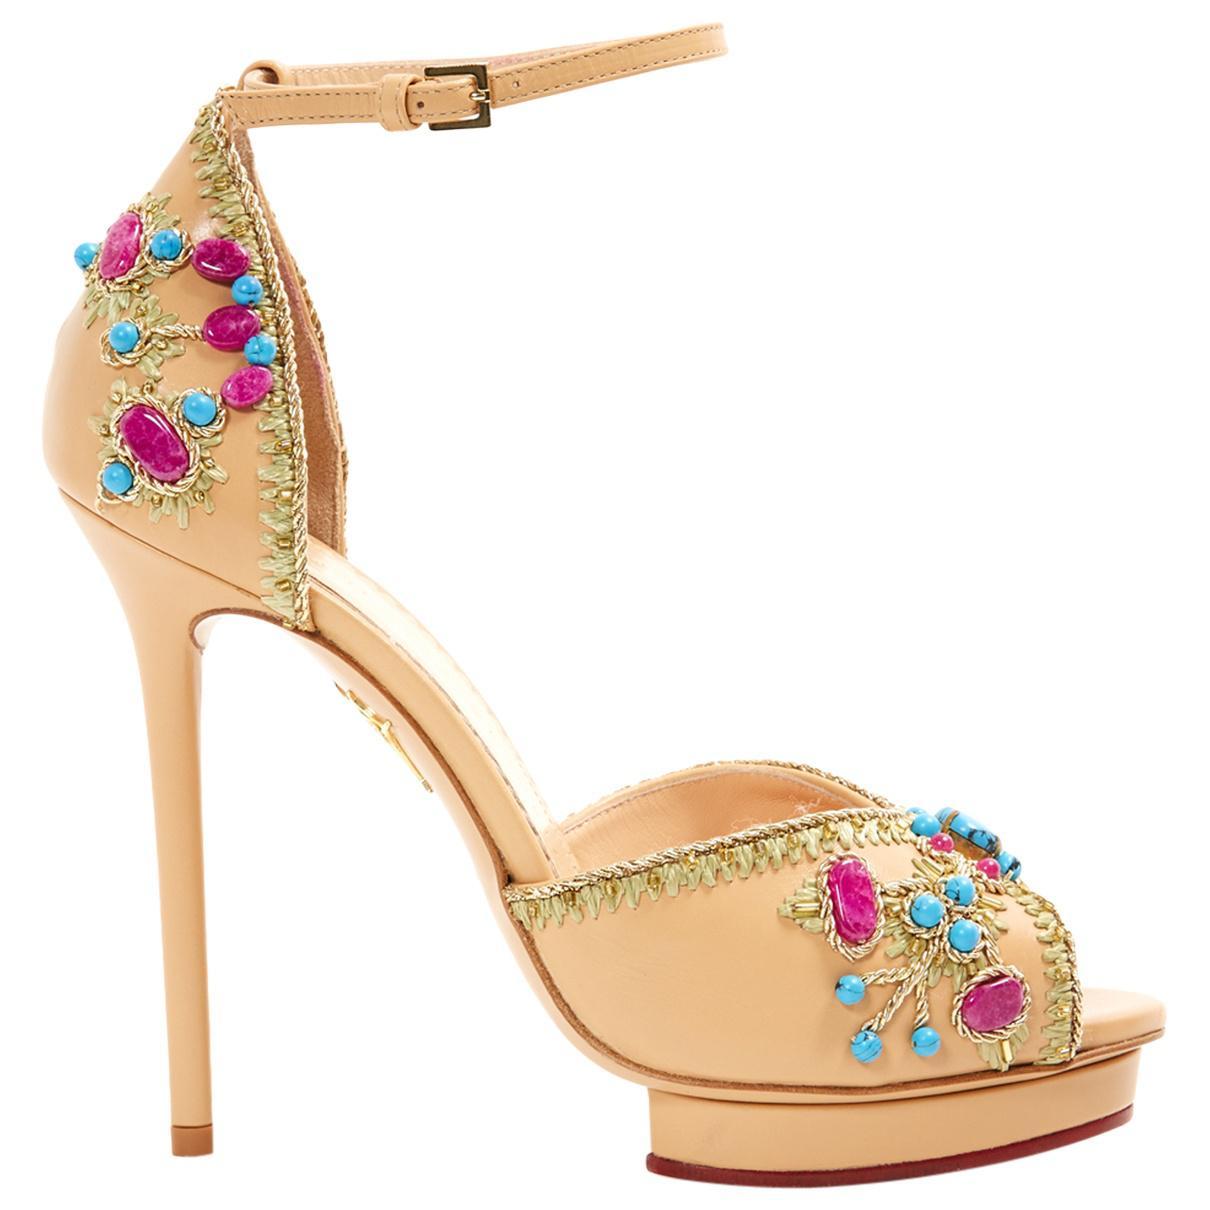 Pre-owned - Leather heels Charlotte Olympia qTkFu8f